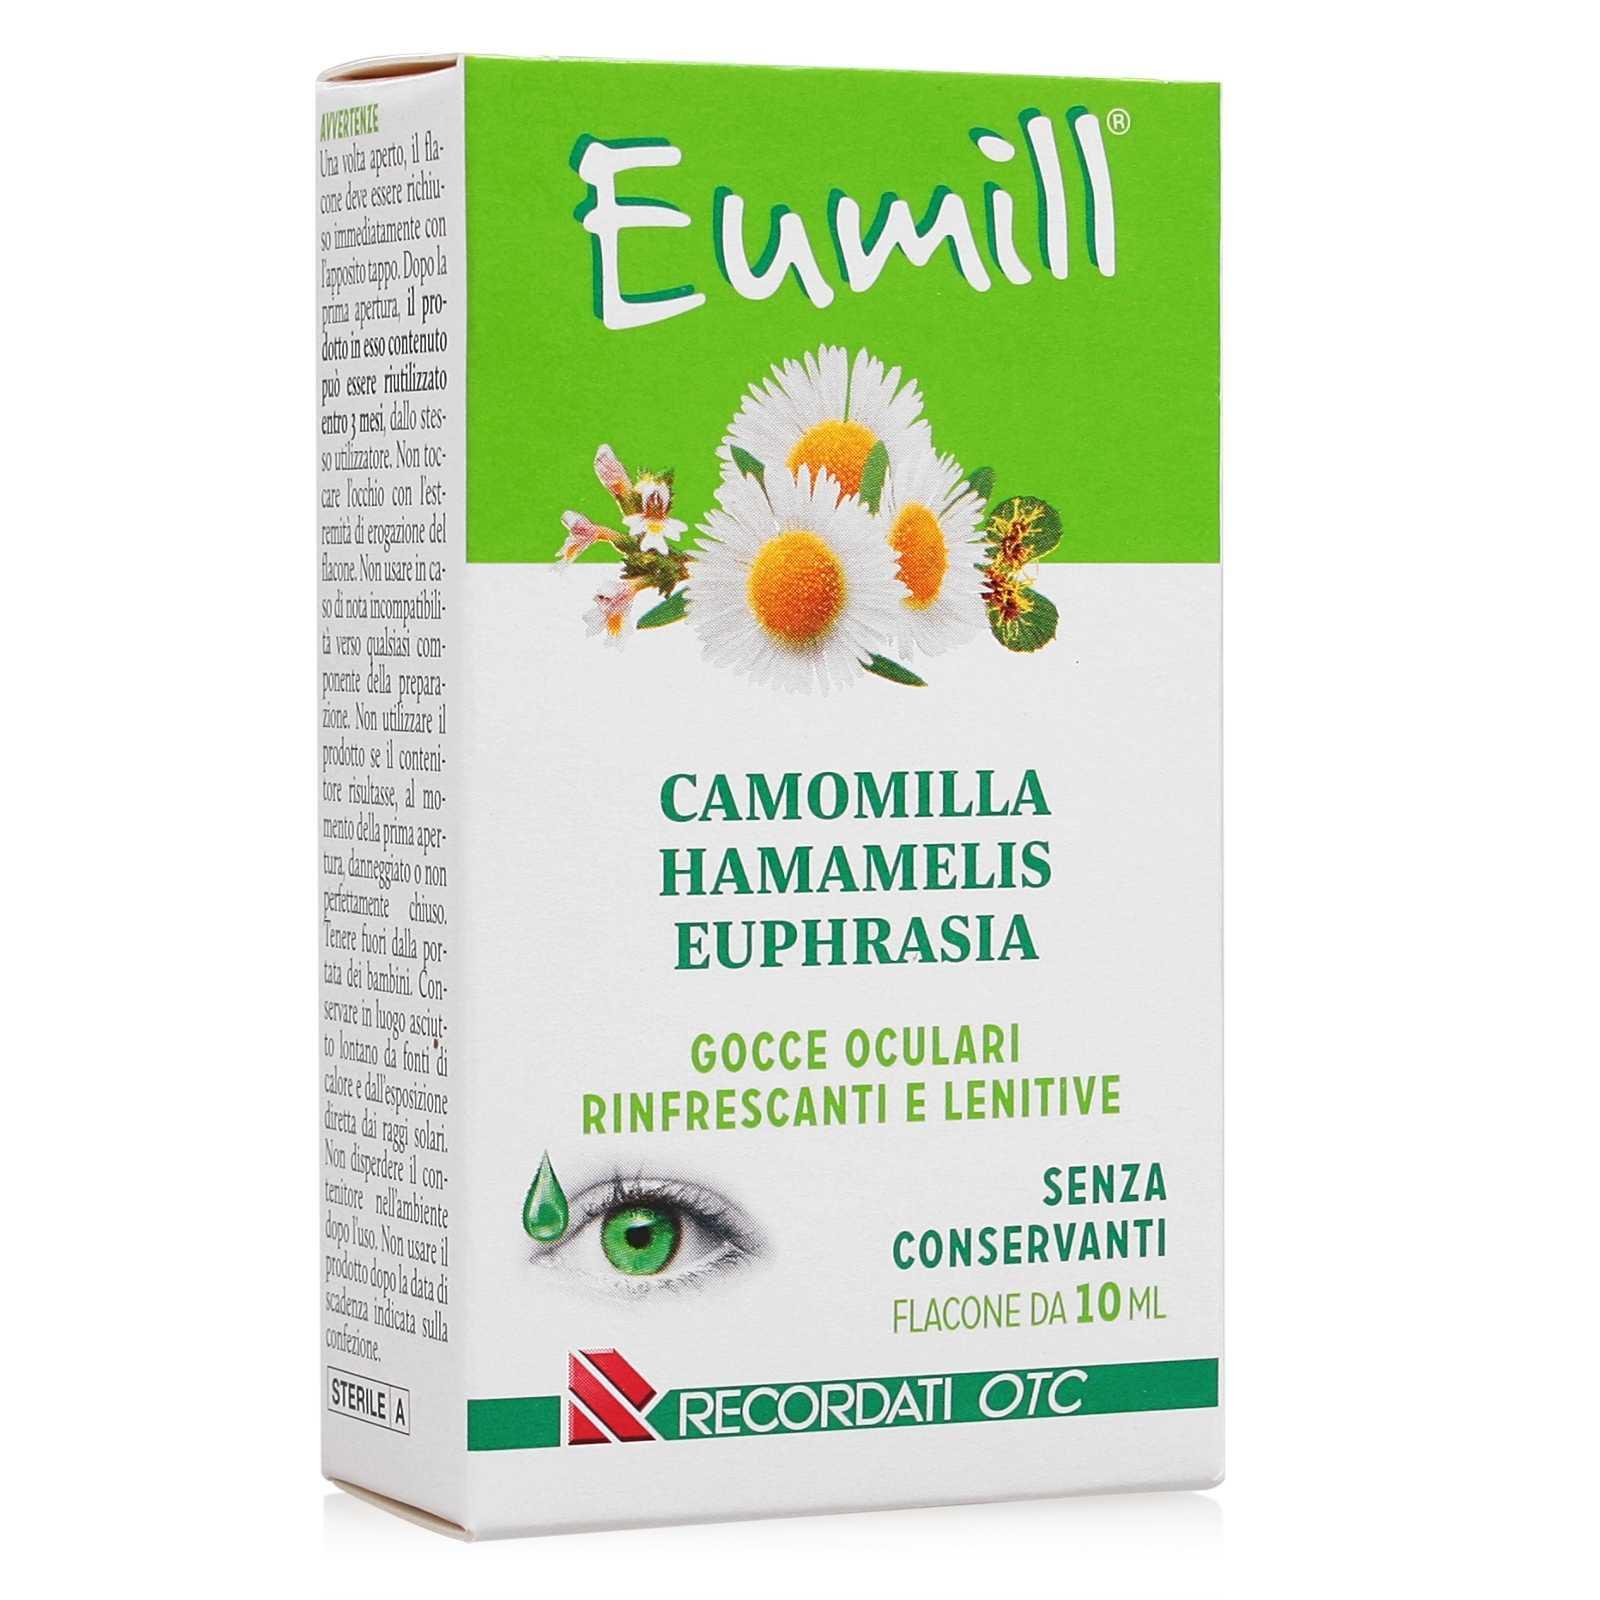 Eumill Camomilla Euphrasia E Hamamelis Collirio Pluridose 10ml Farmacia Roggia